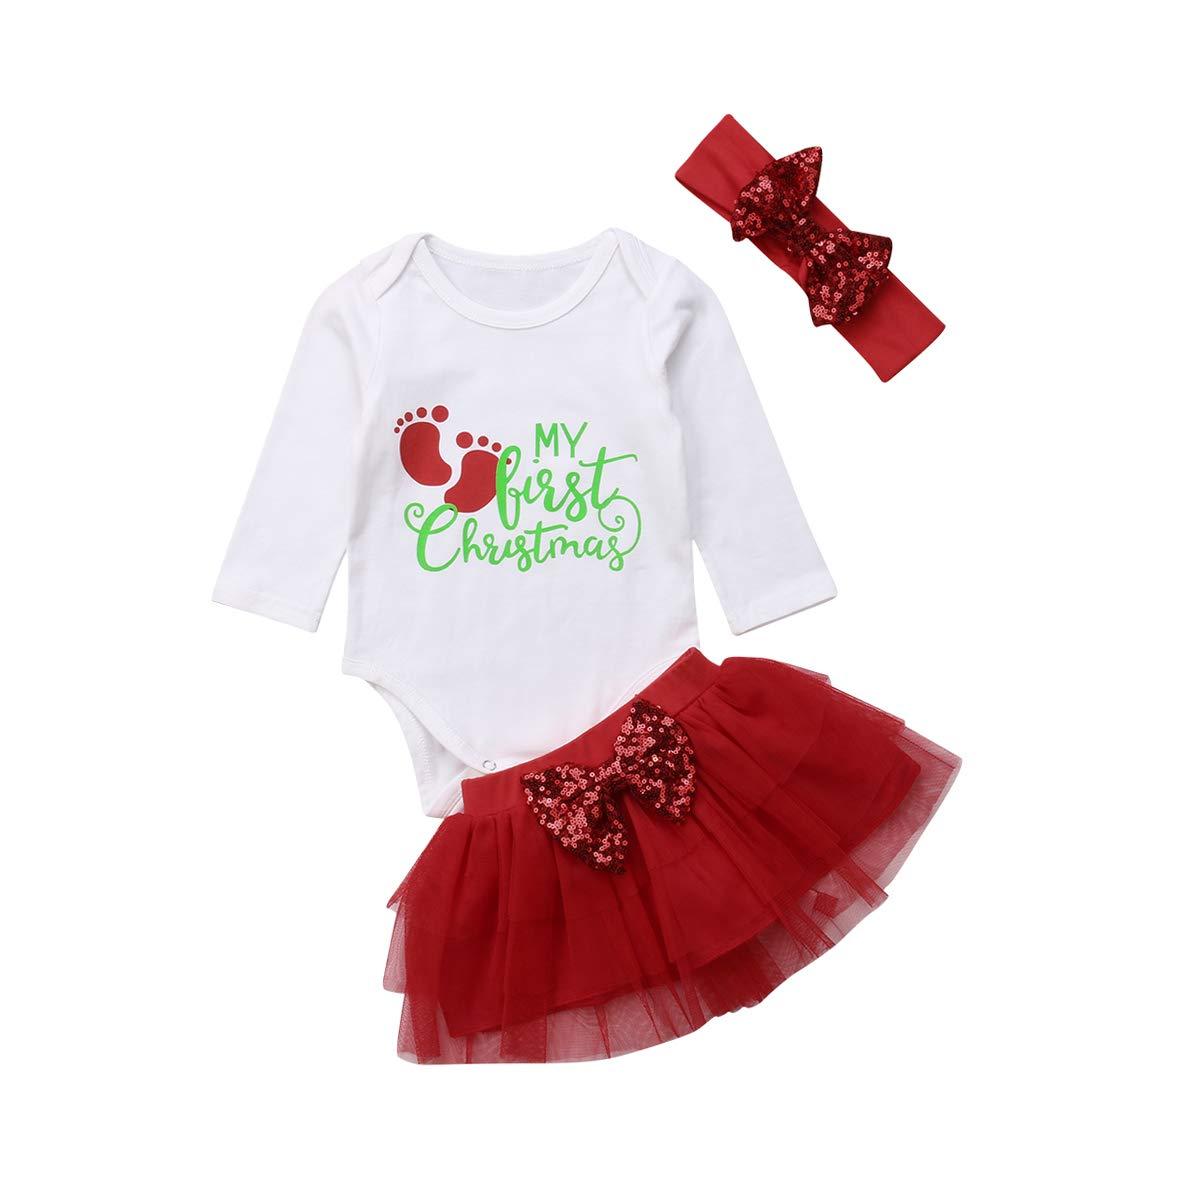 7874bf10e400 Christmas Newborn Infant Baby Girl Clothes Long Sleeve Romper+Tutu Dress  Skirt+Bowtie Headband